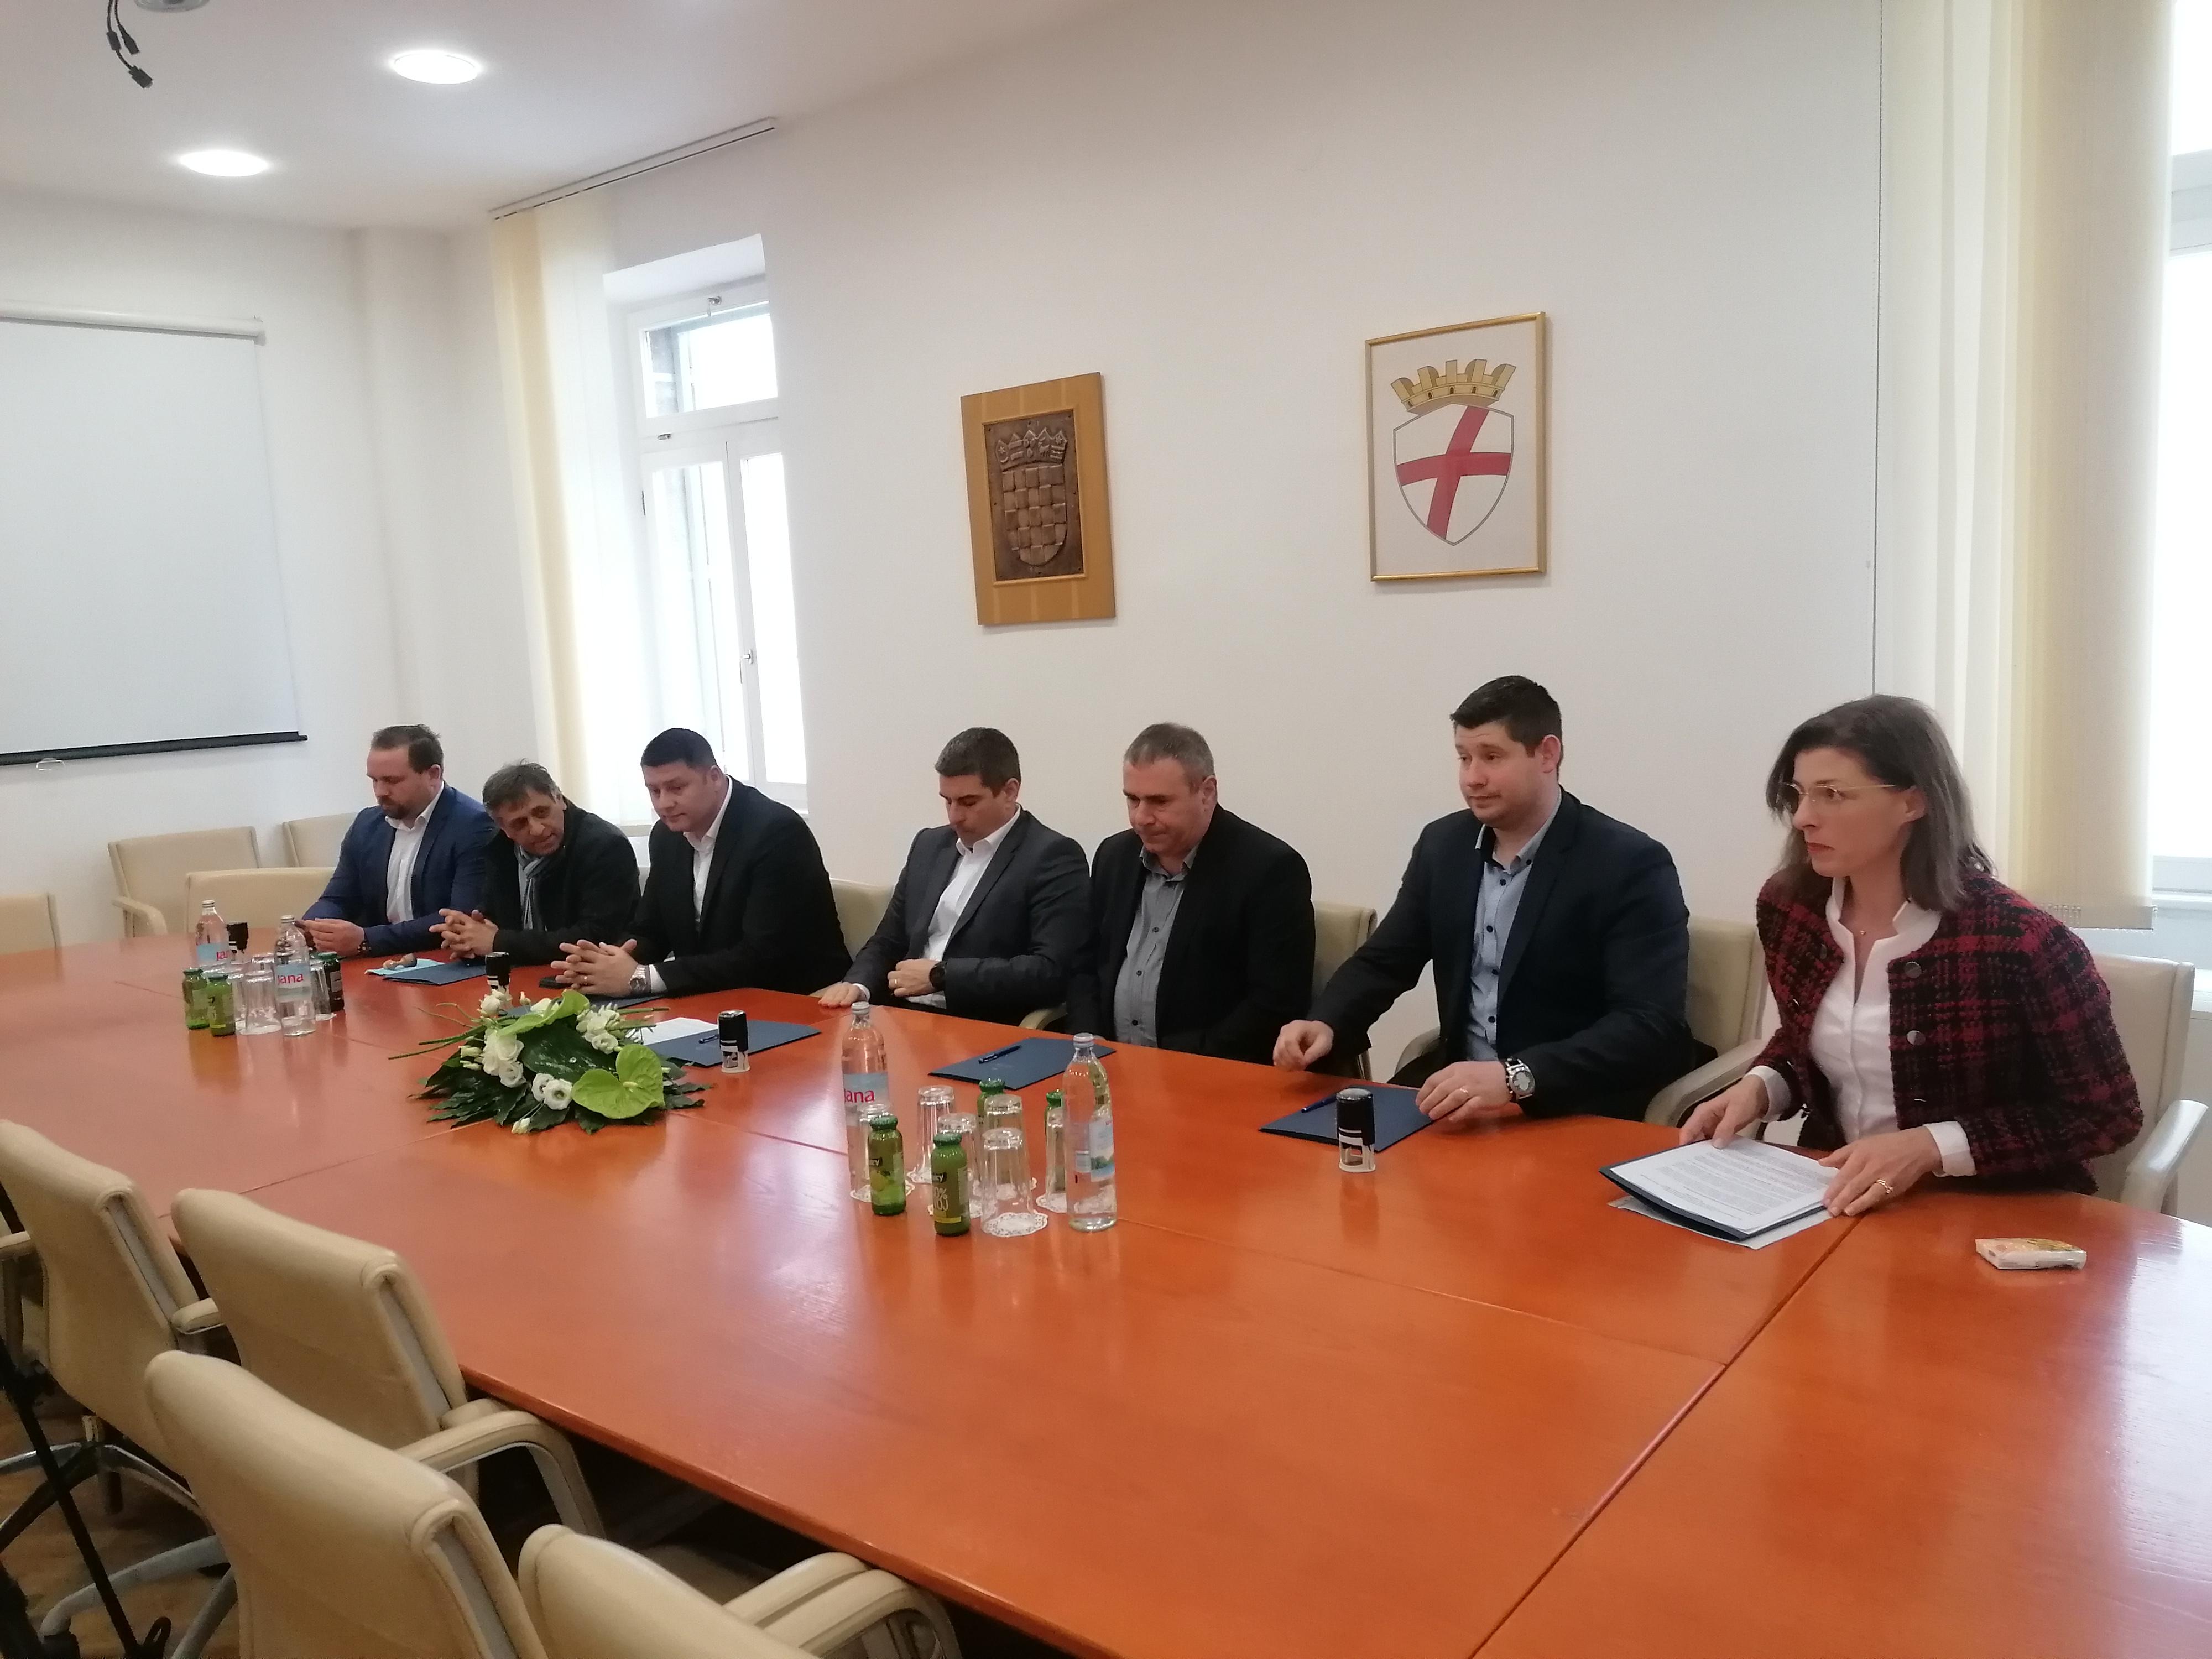 Potpisan Sporazum o suradnji na izgradnji širokopojasne infrastrukture